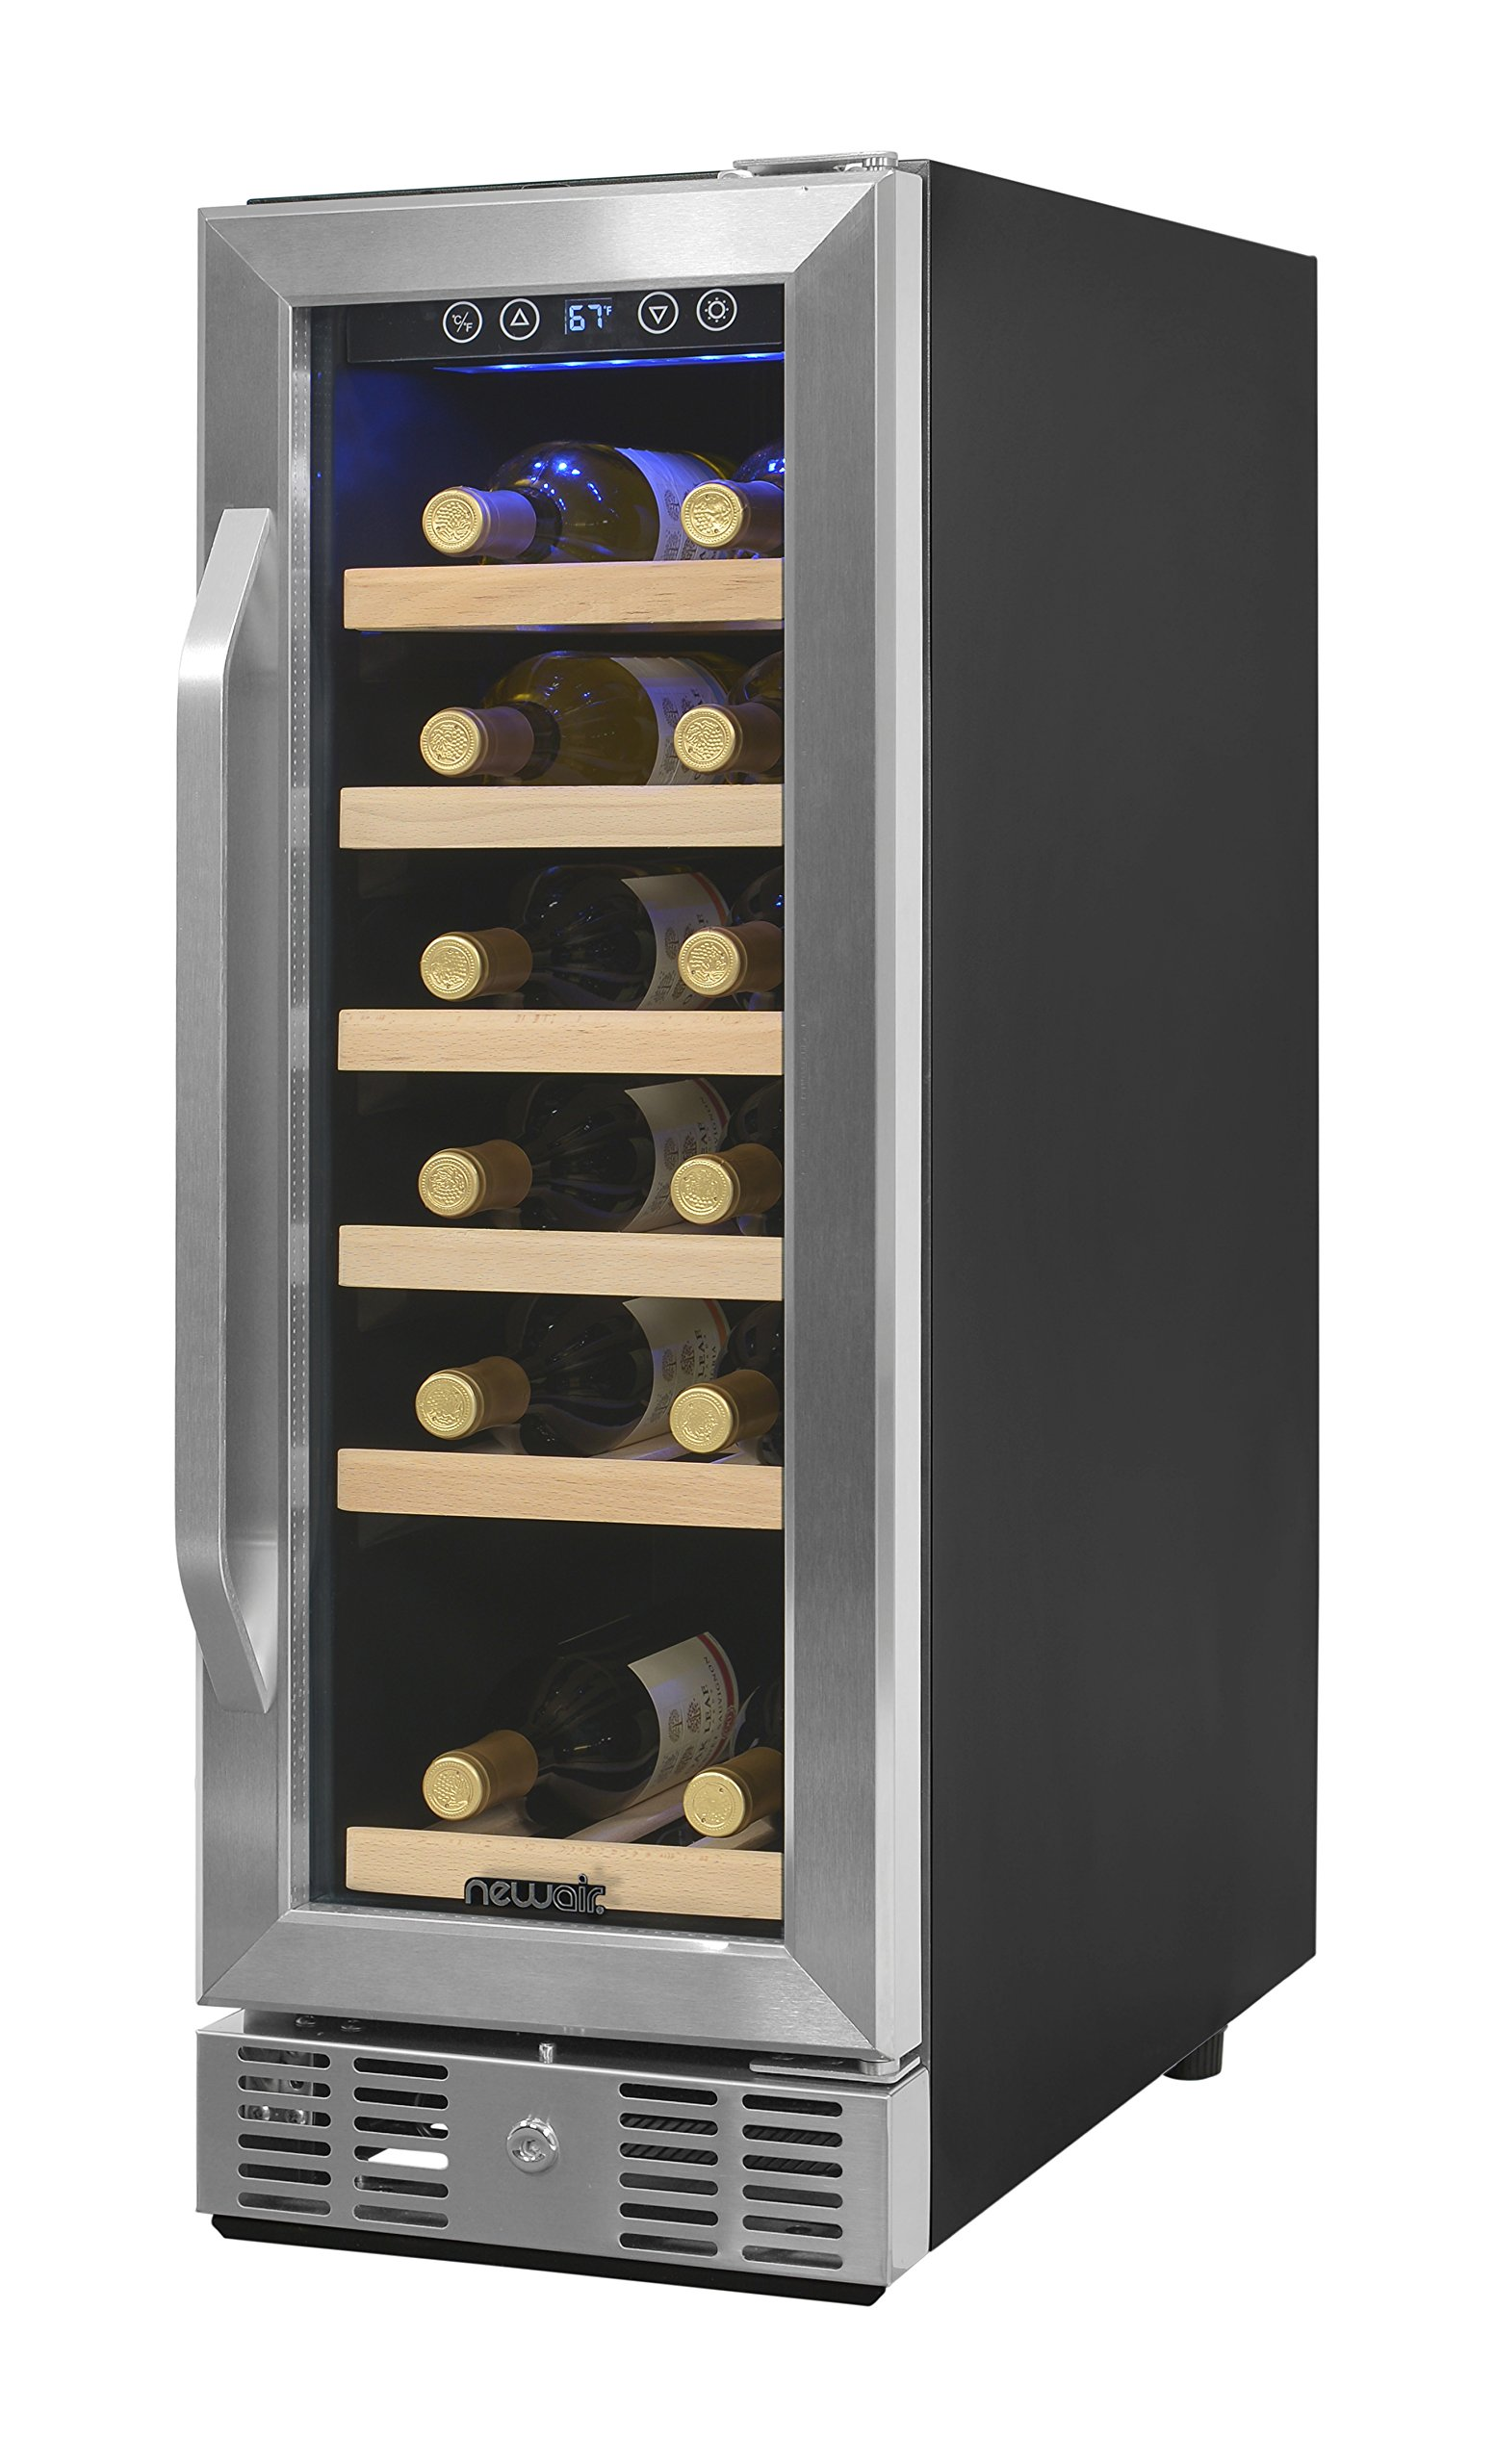 NewAir AWR-190SB Compact 19 Bottle Compressor Wine Cooler, Black/Stainless Steel